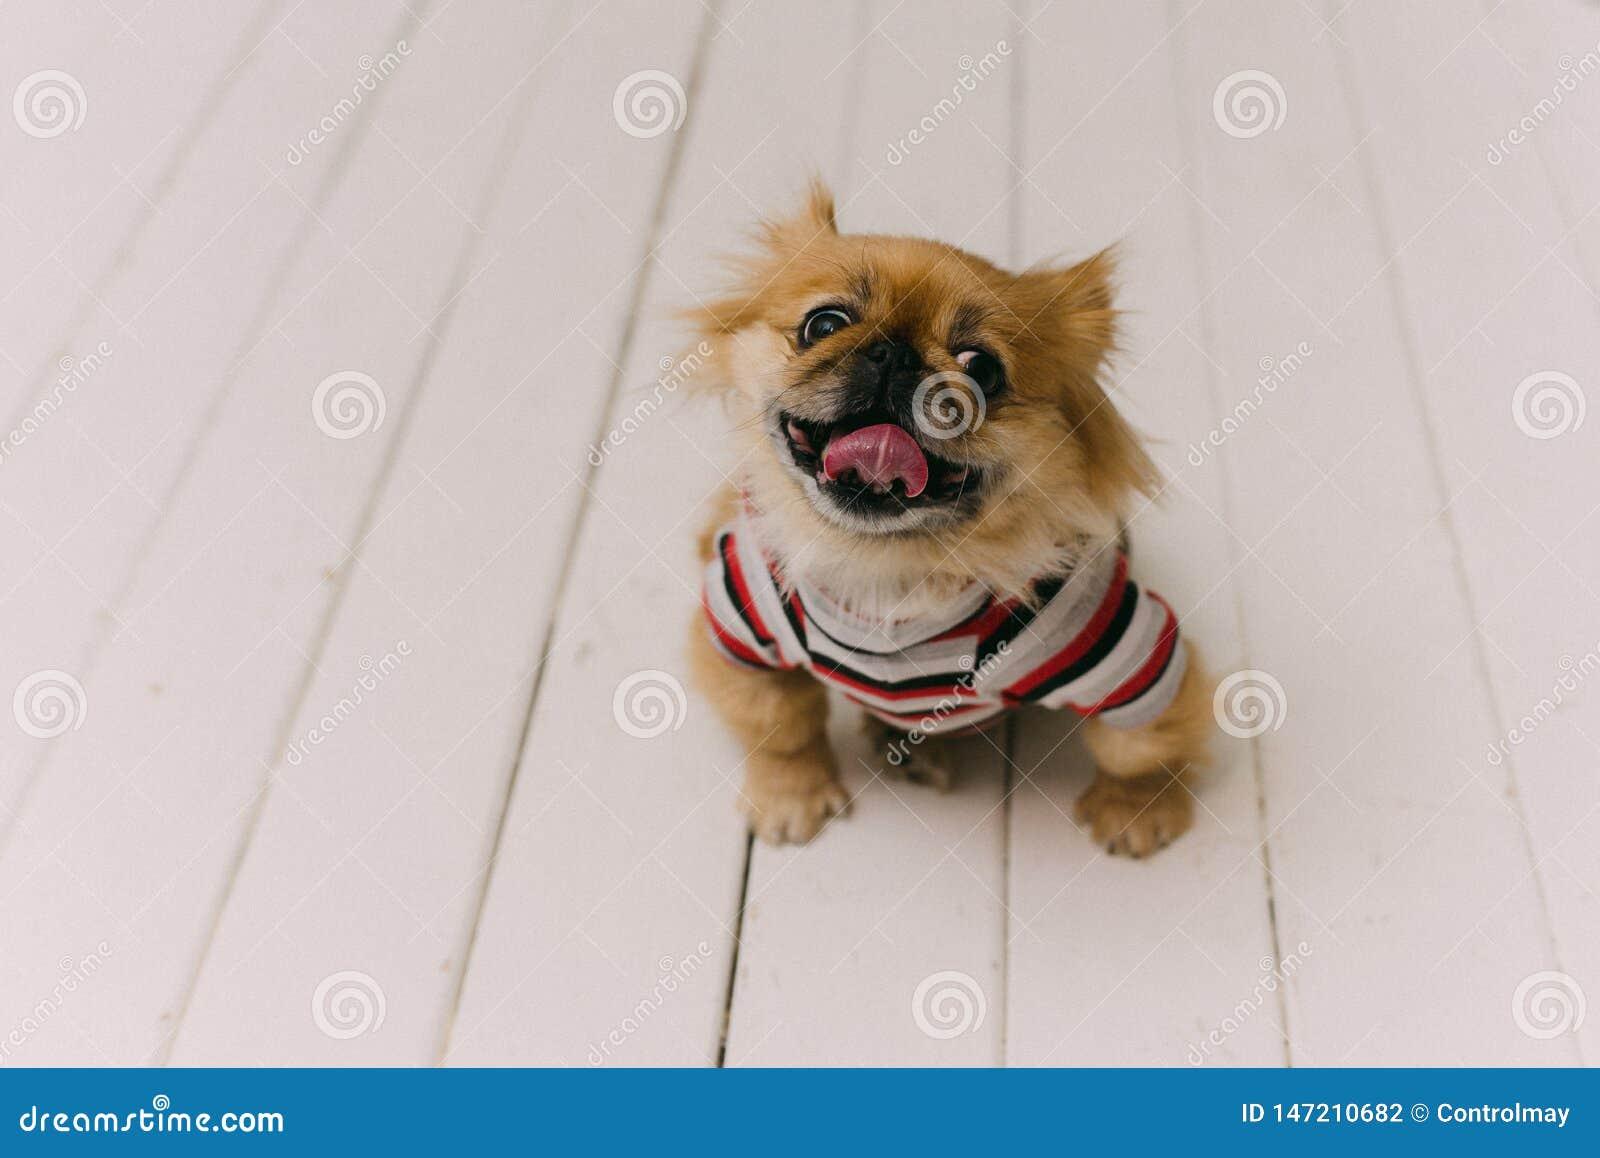 Funny and cute pekinese